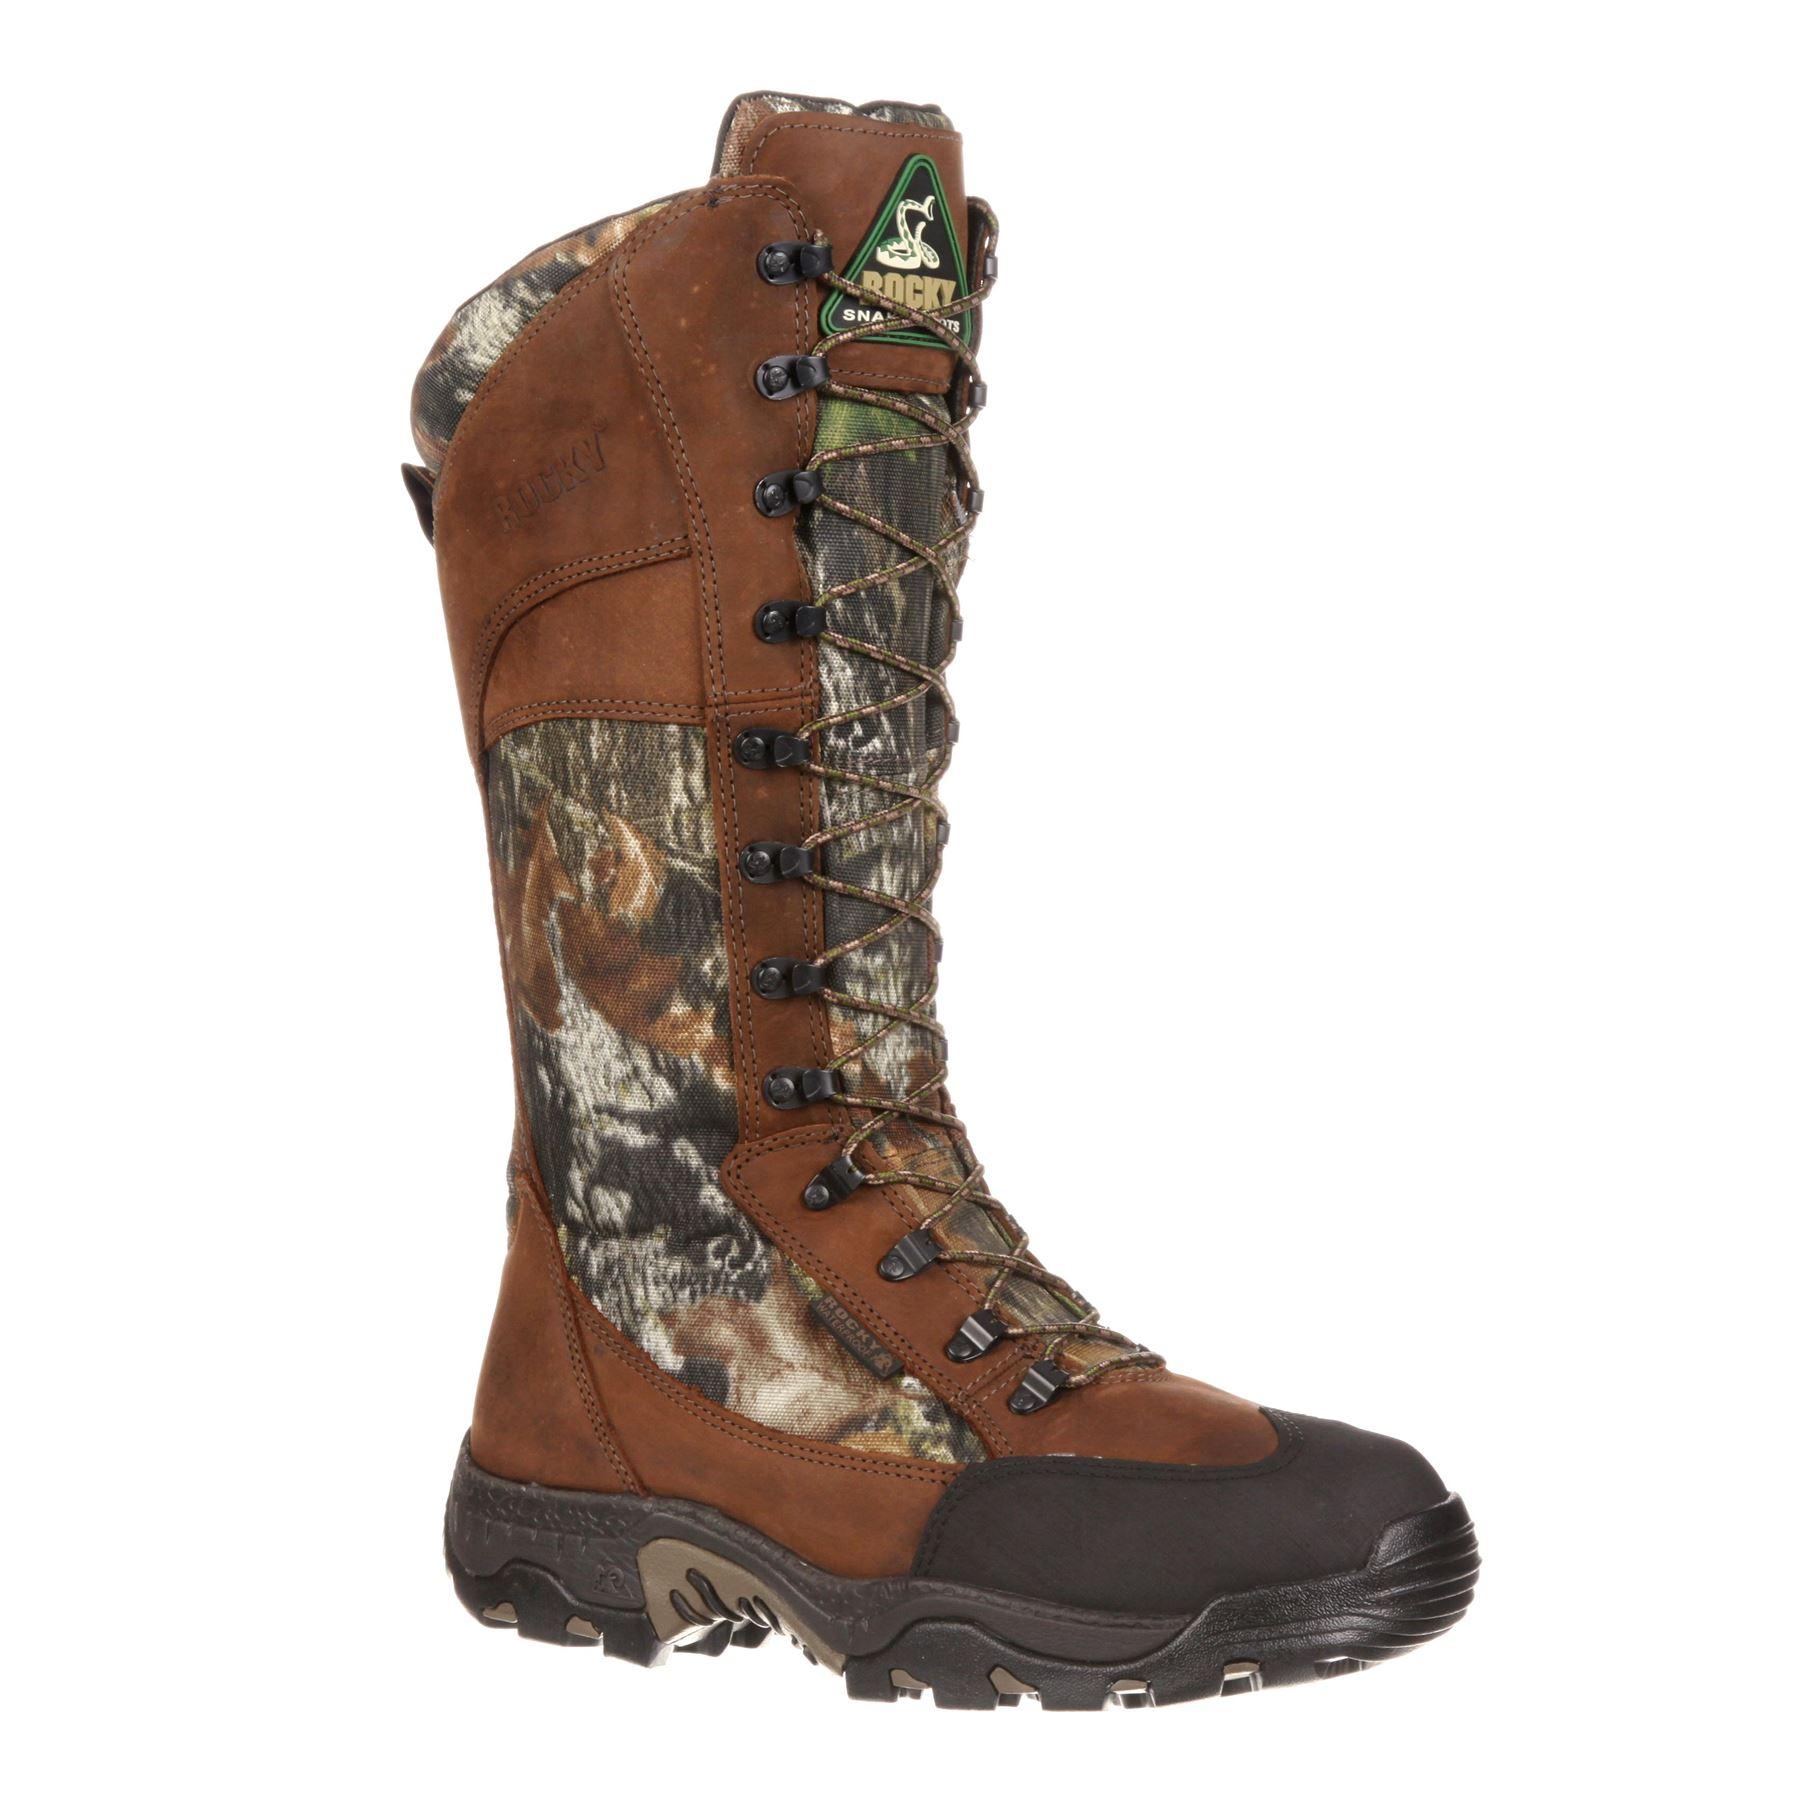 rocky mens rocky classic lynx waterproof side zip snake boots fq0007534 ebay. Black Bedroom Furniture Sets. Home Design Ideas